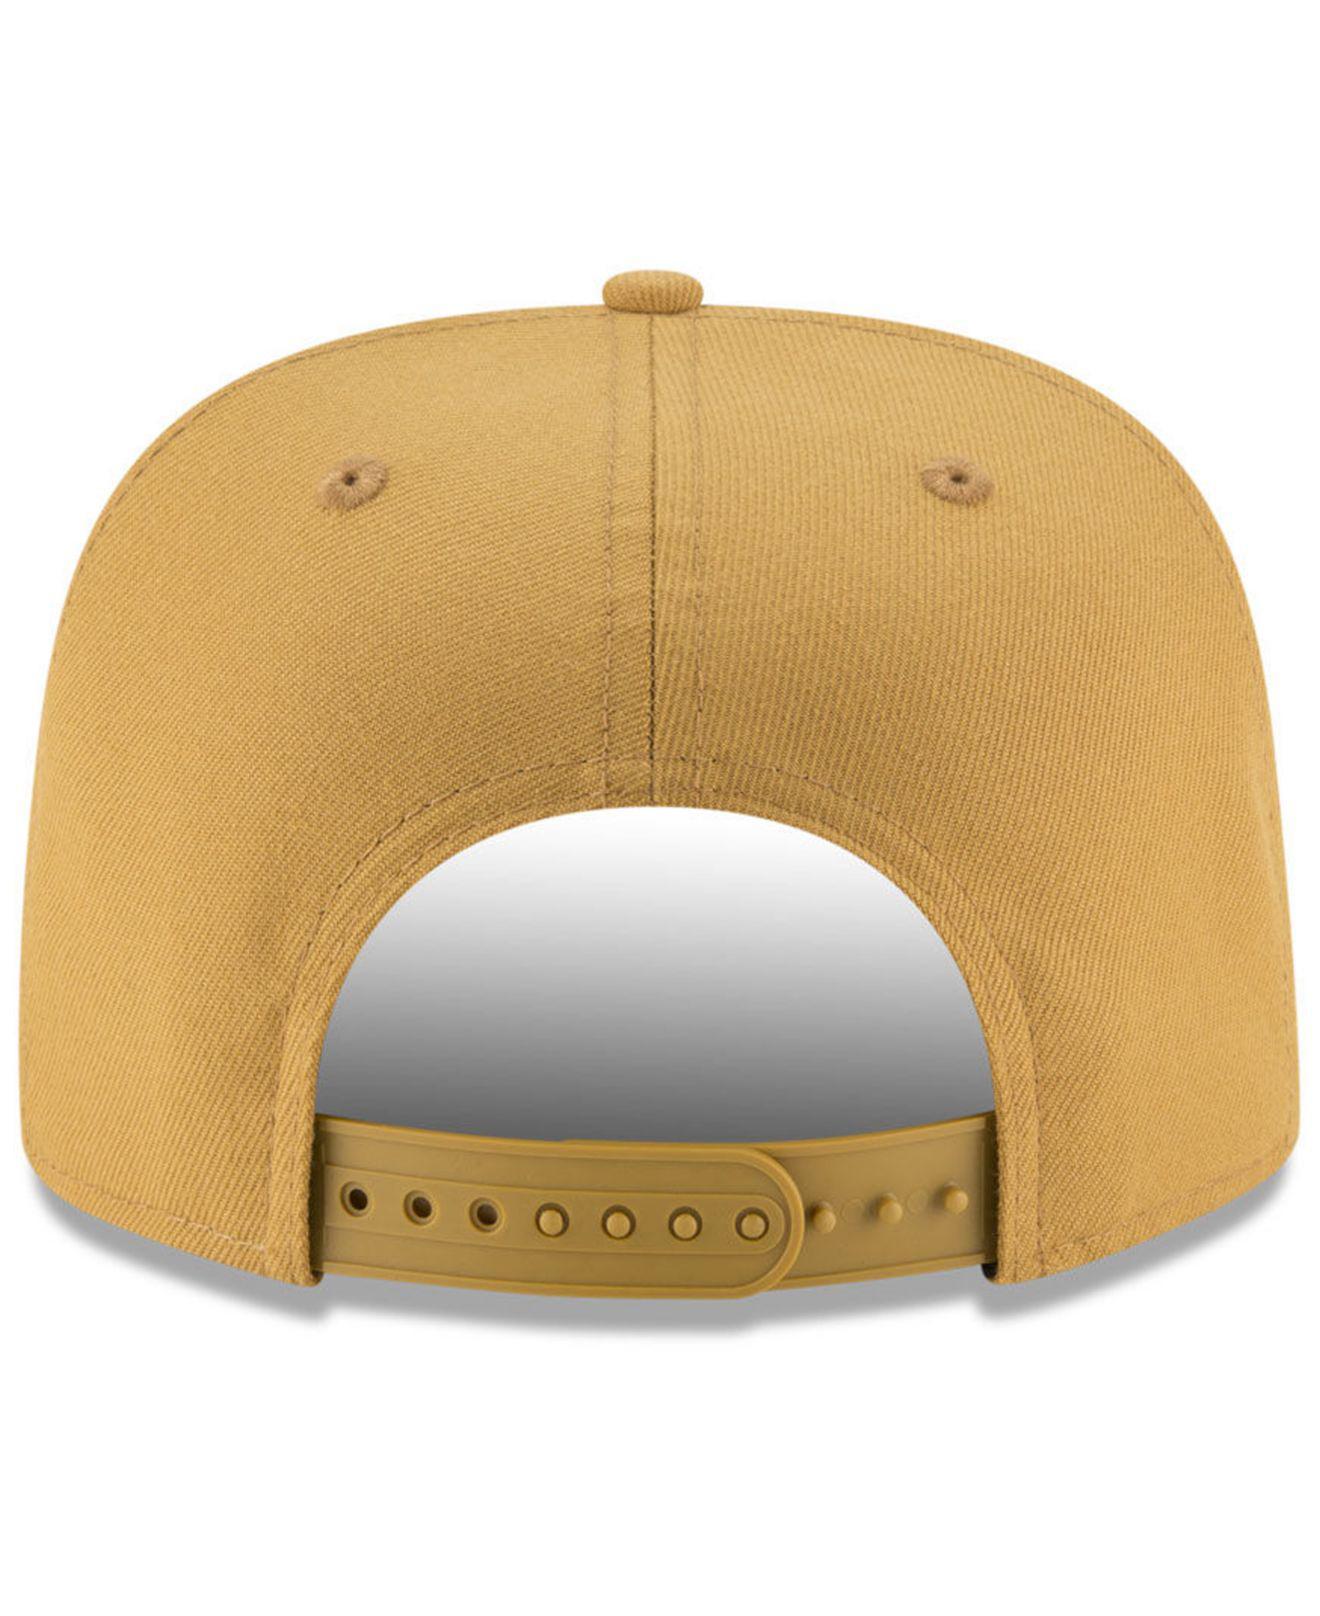 new product bfbc5 c369b ... wholesale new york knicks retro basic 9fifty snapback cap for men lyst.  view fullscreen 26b7f